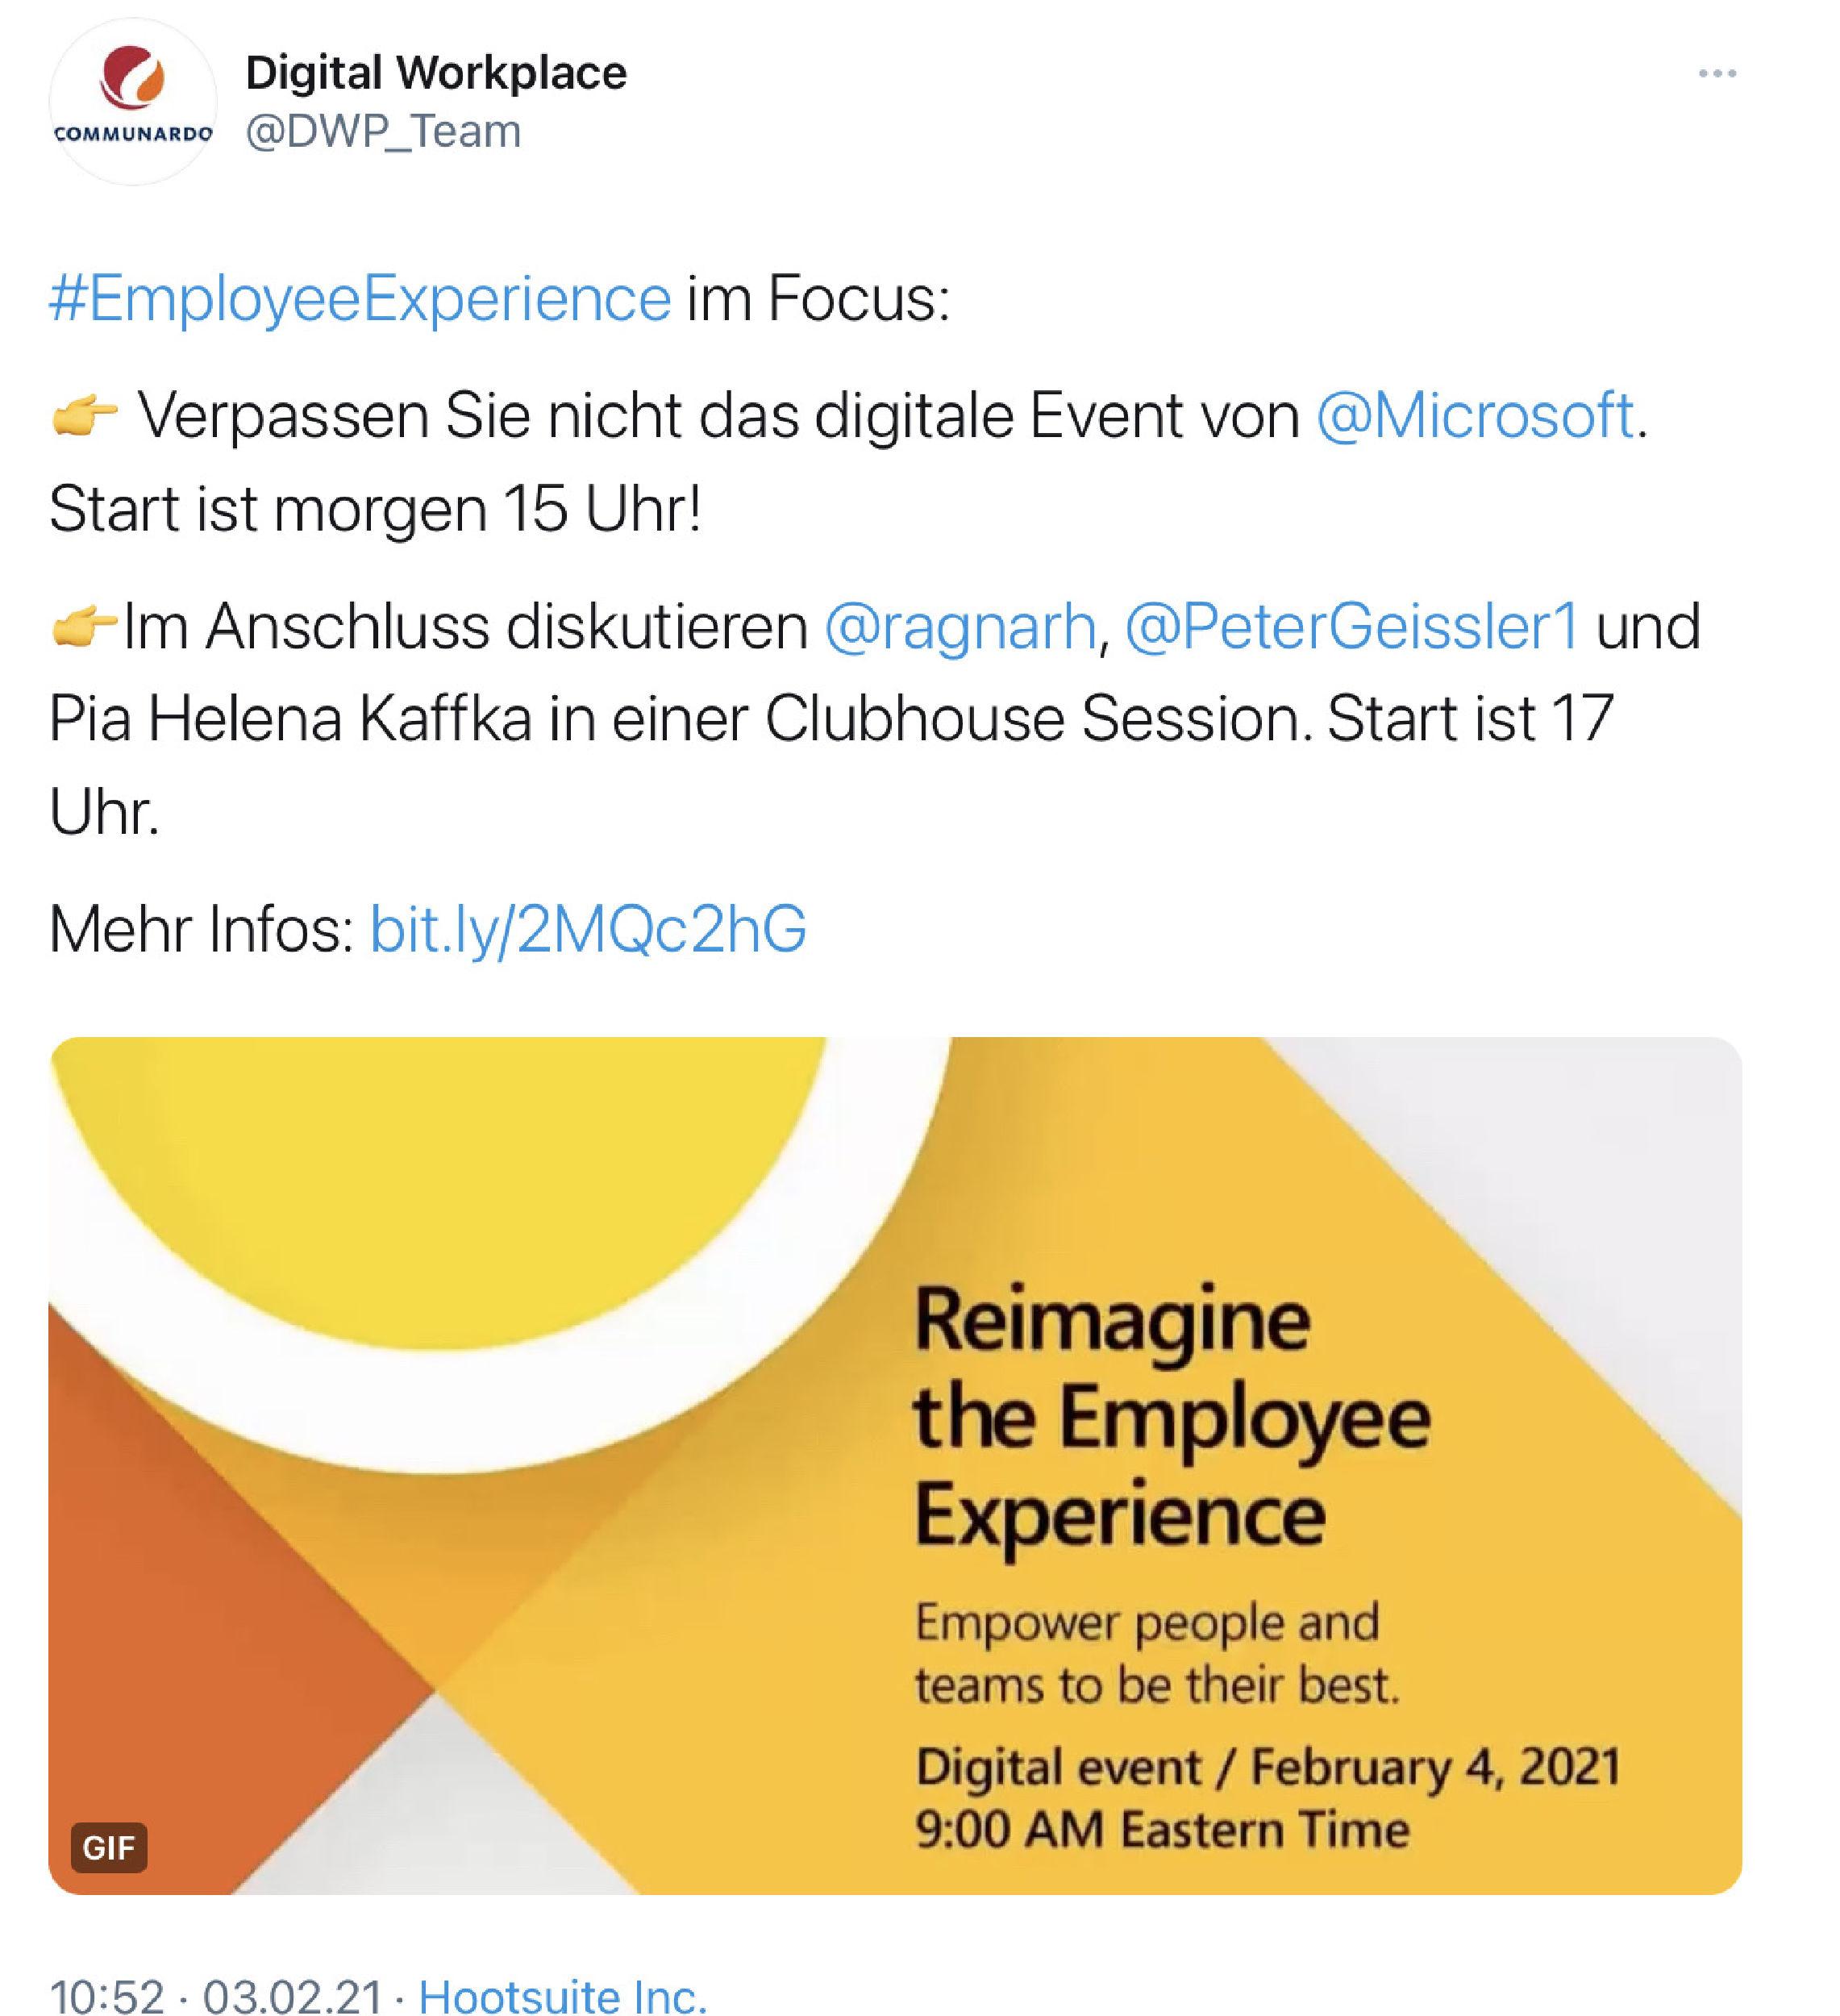 Reimagine Employee Experience